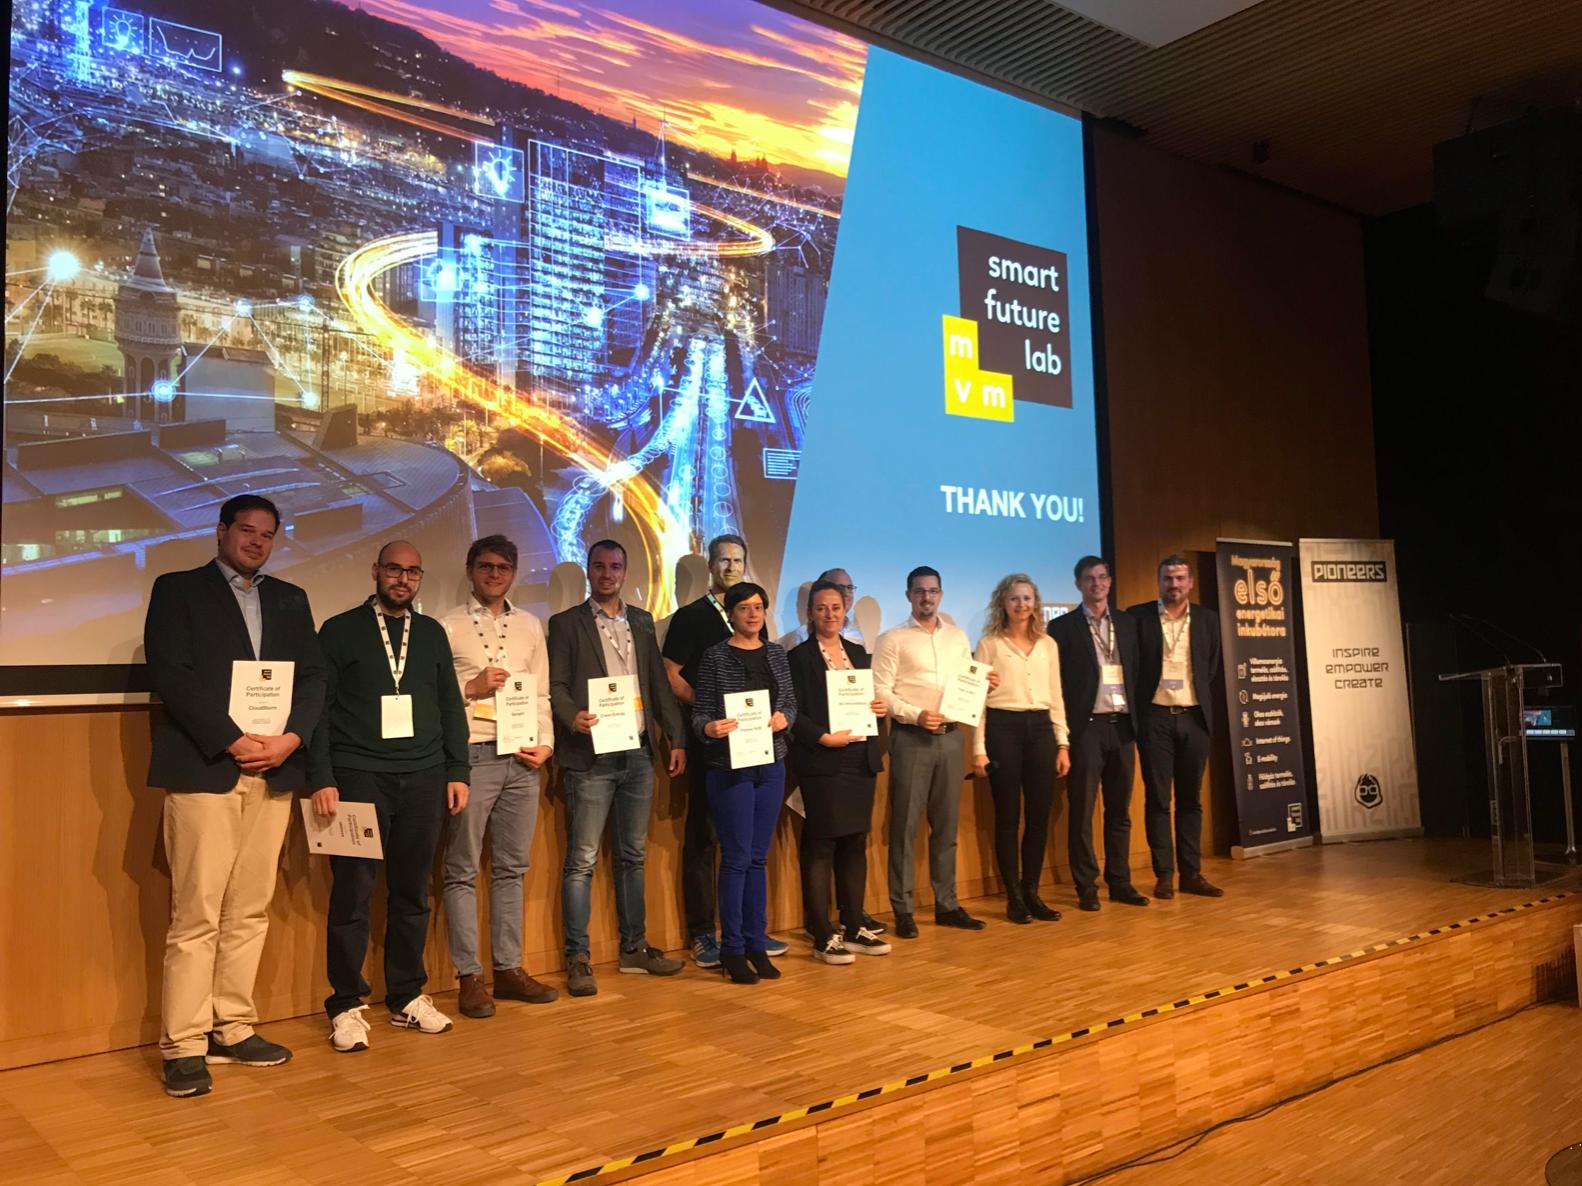 2019 10 09 Smart Future Lab Hackathon Budapest 5